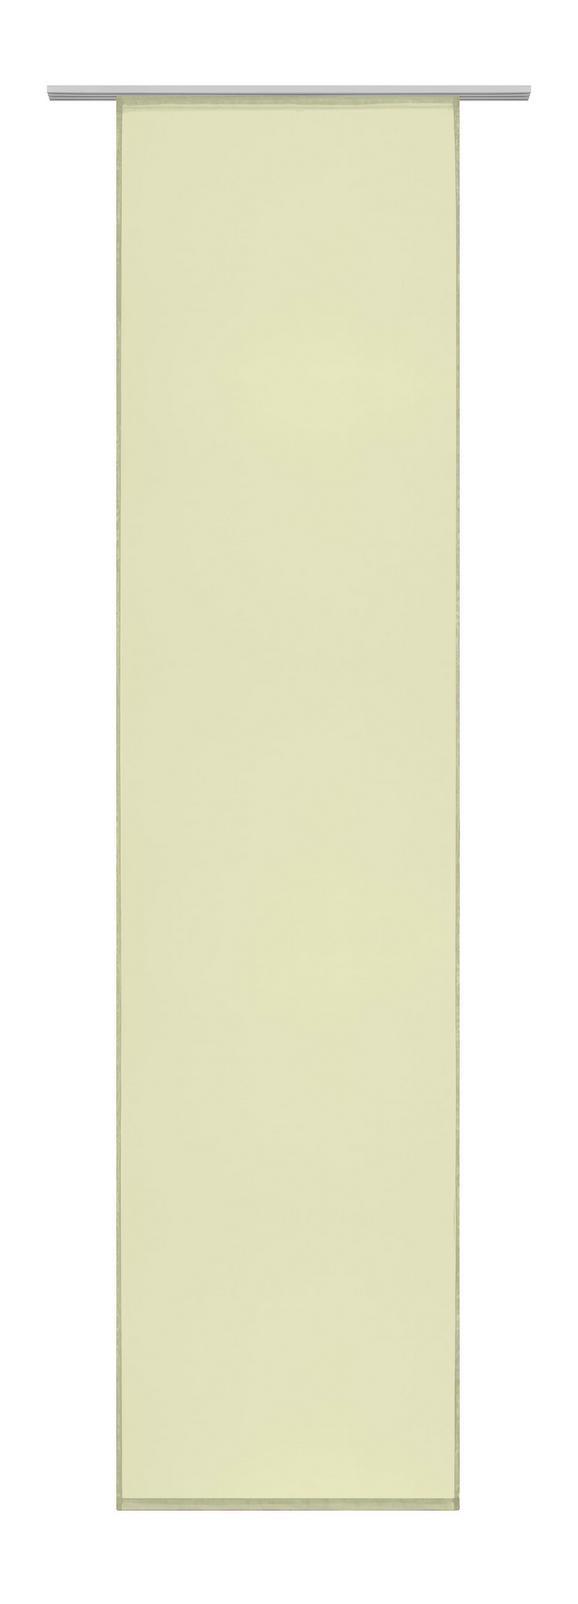 Lapfüggöny Flipp - zöld, textil (60/245cm) - MÖMAX modern living